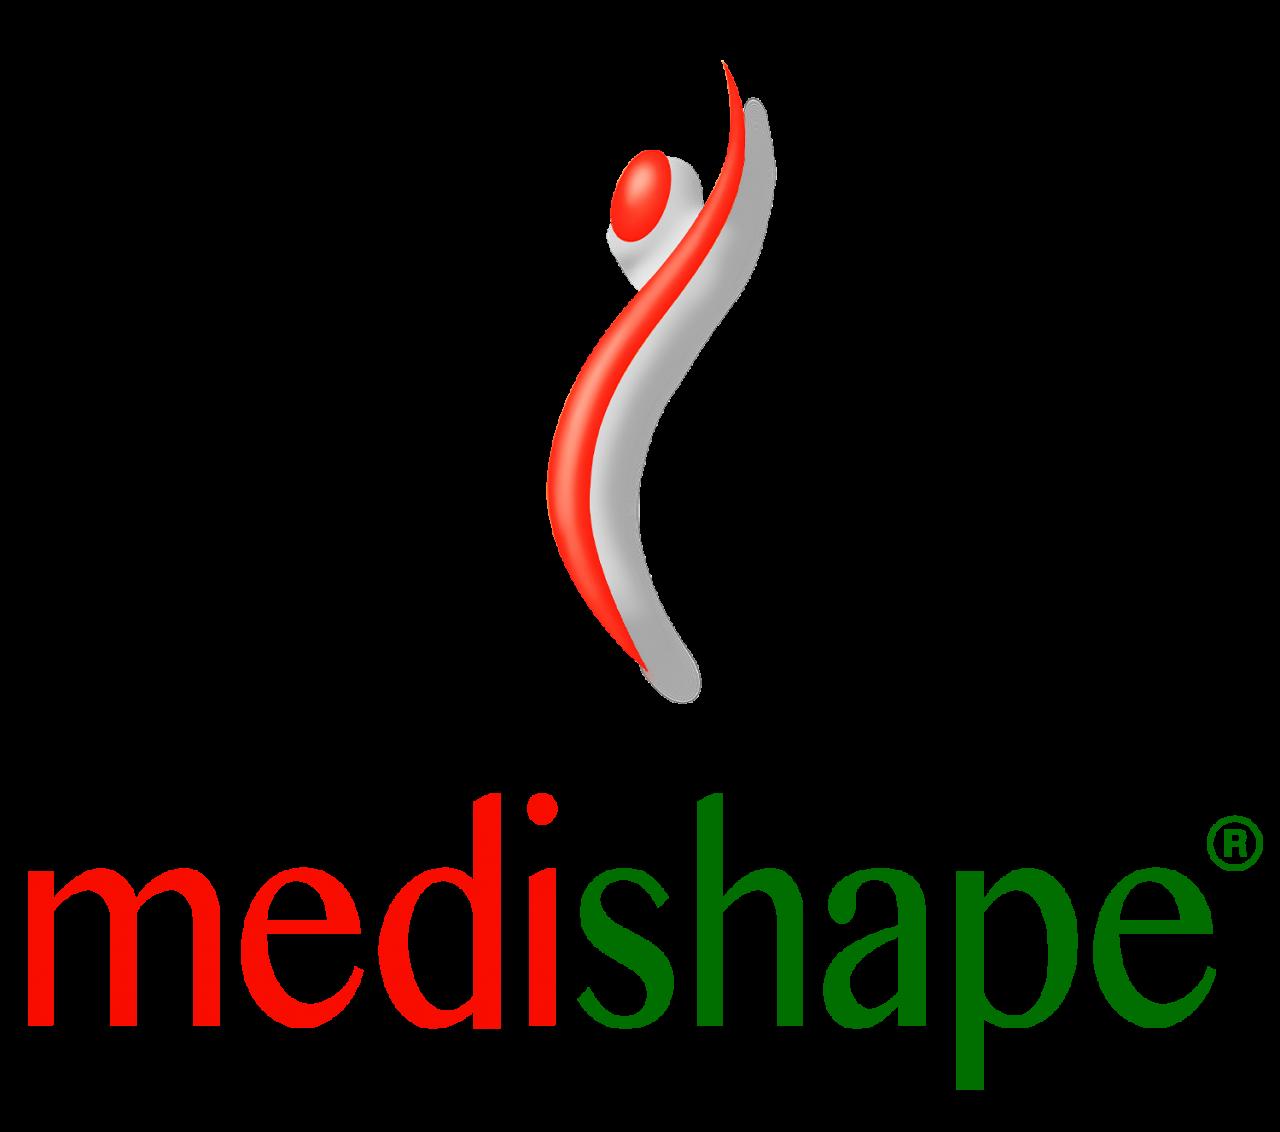 medishape Home